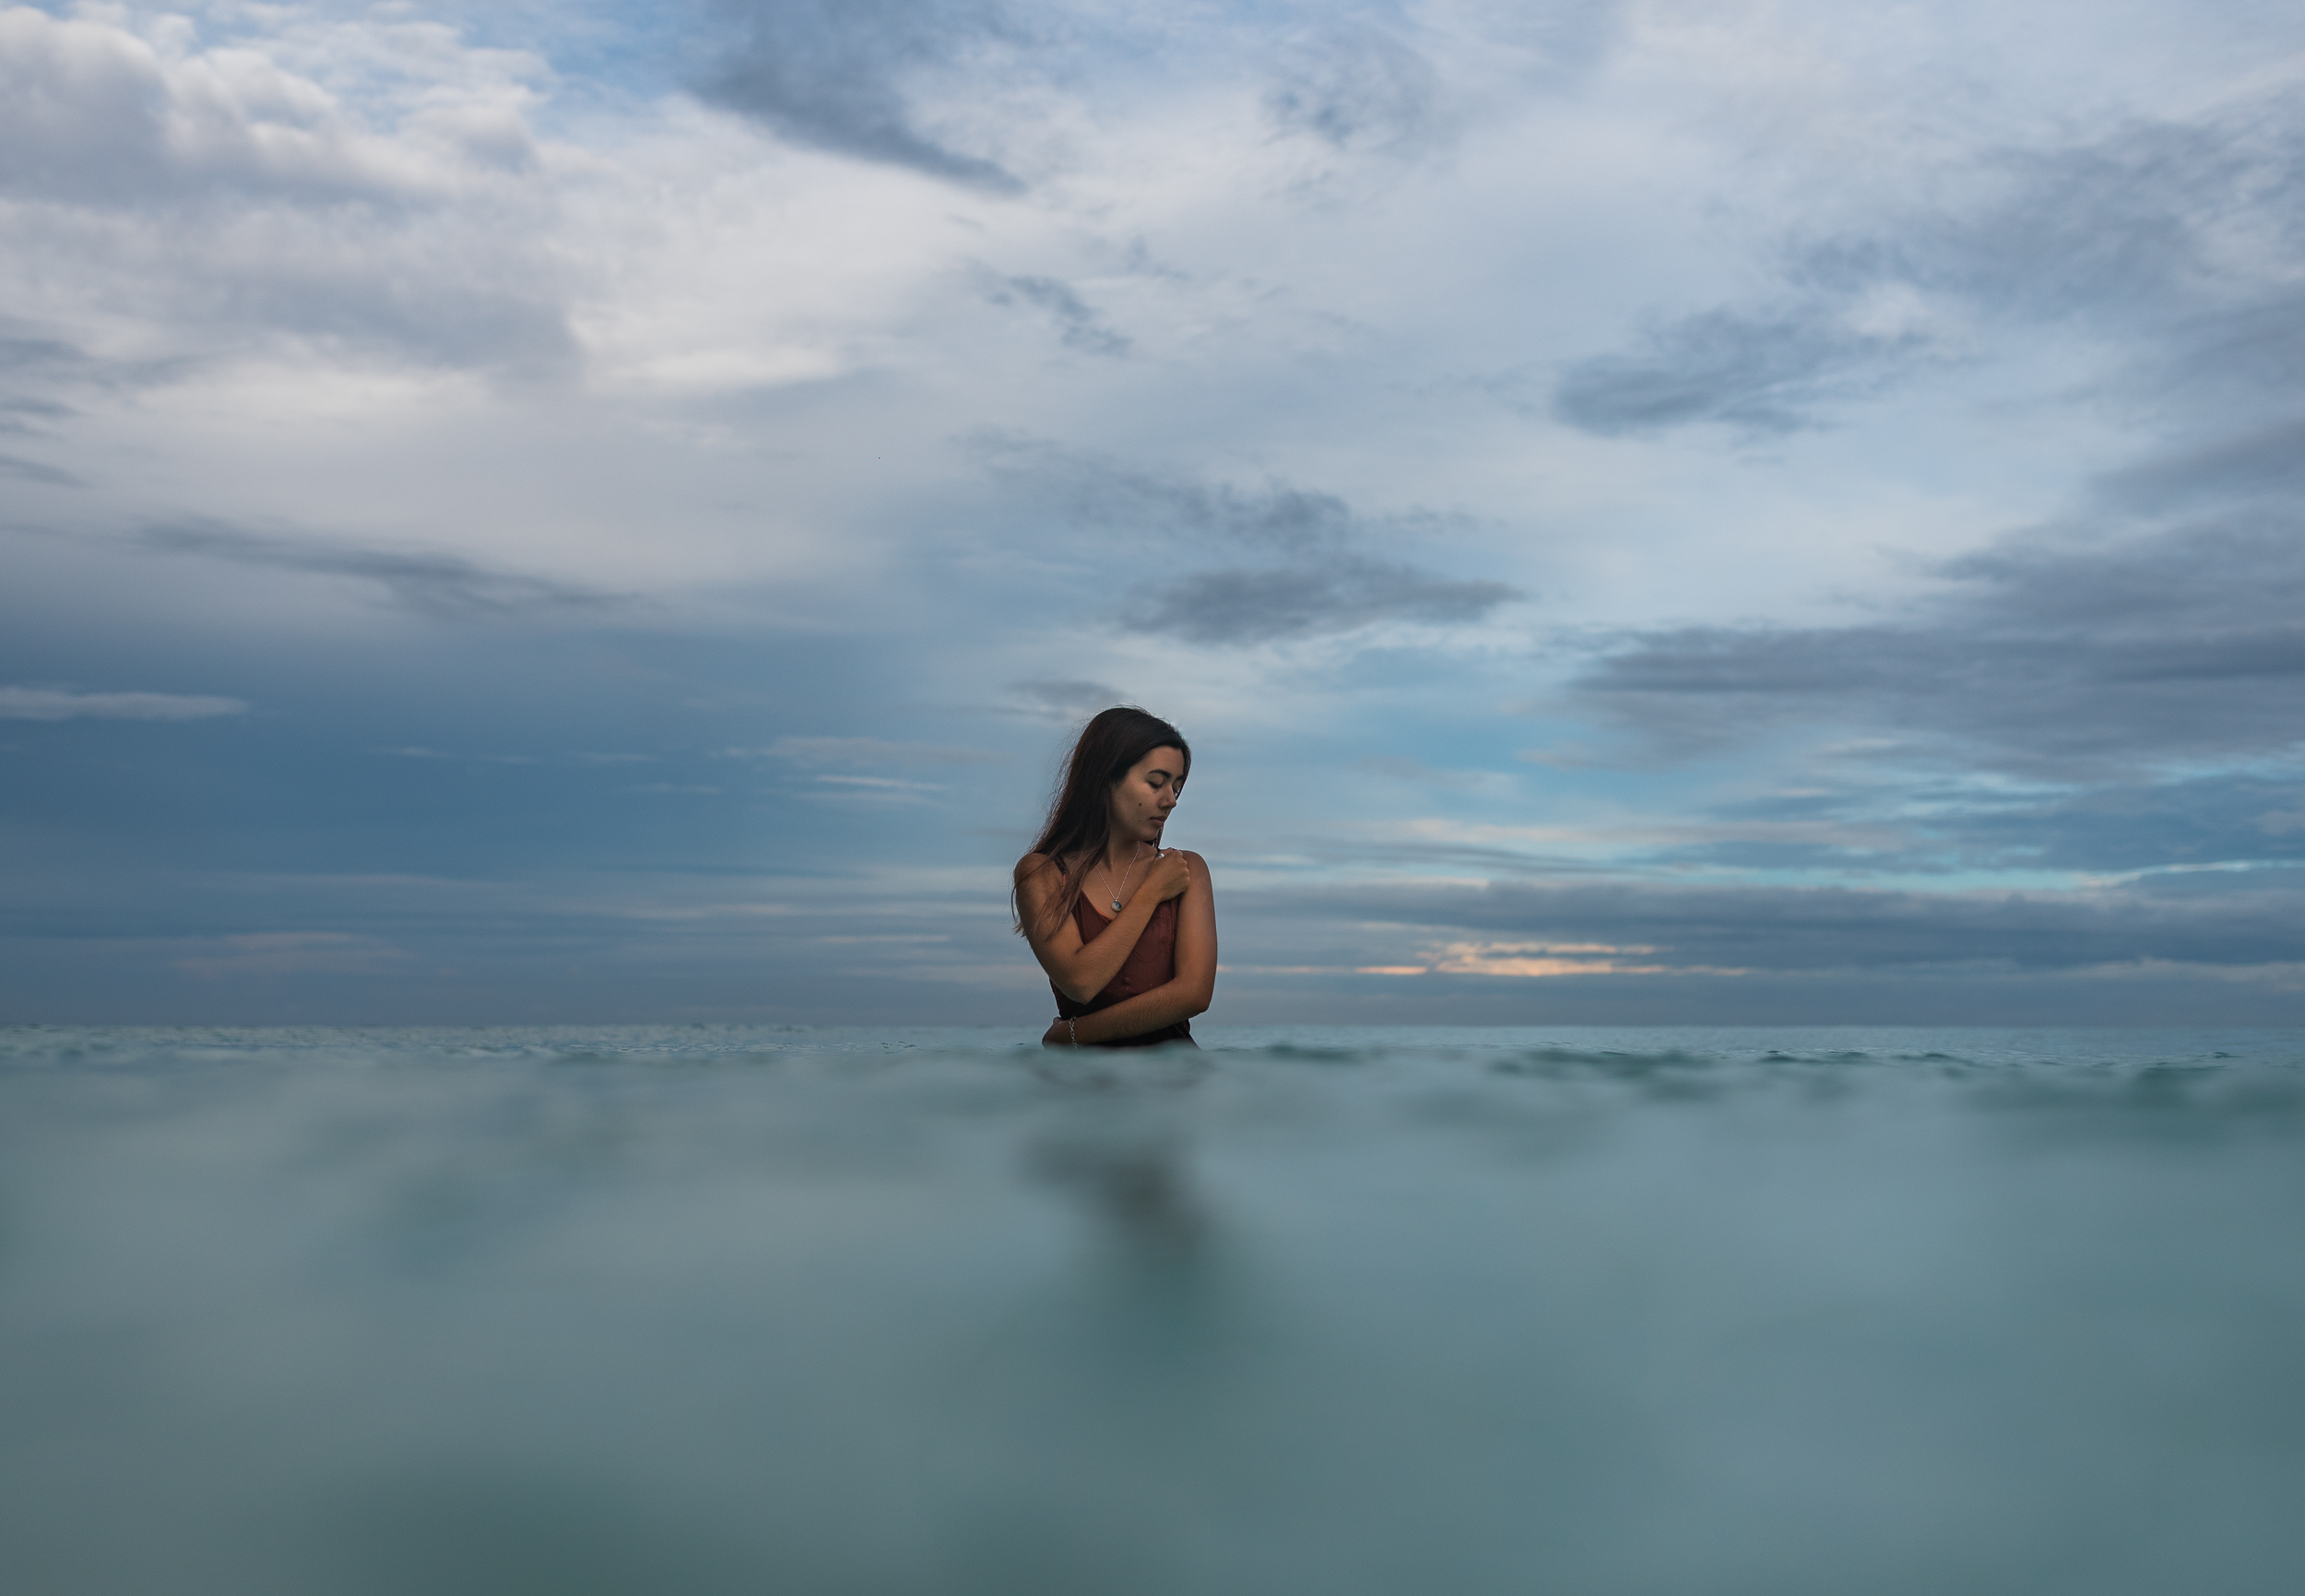 woman-model-branding-photography-tumon-guam-roxanne-augusta-6.jpg